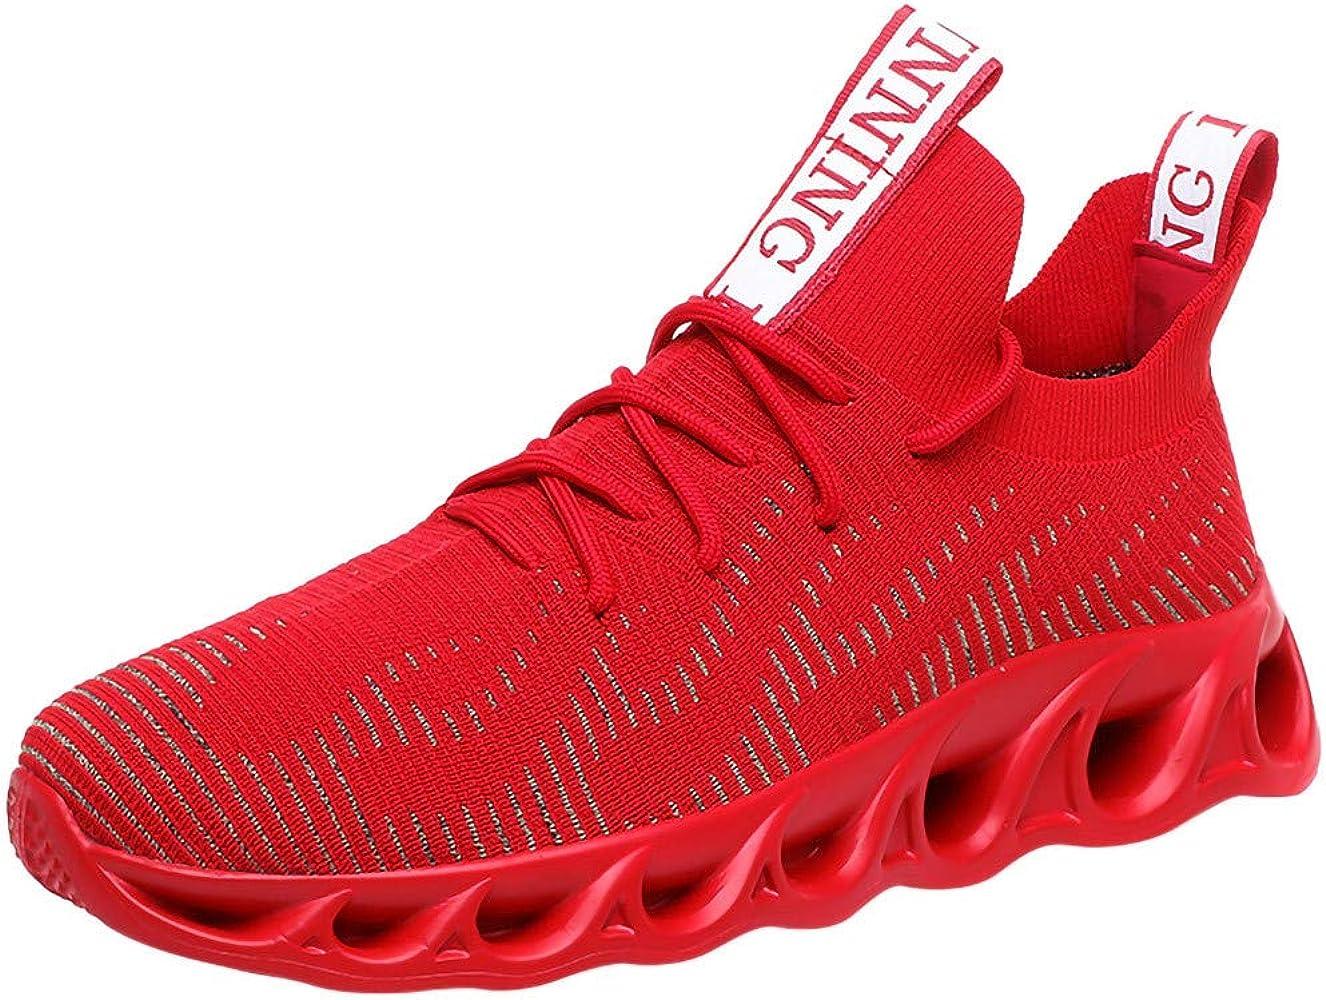 Sameno Street Sneakers Sock Sneakers